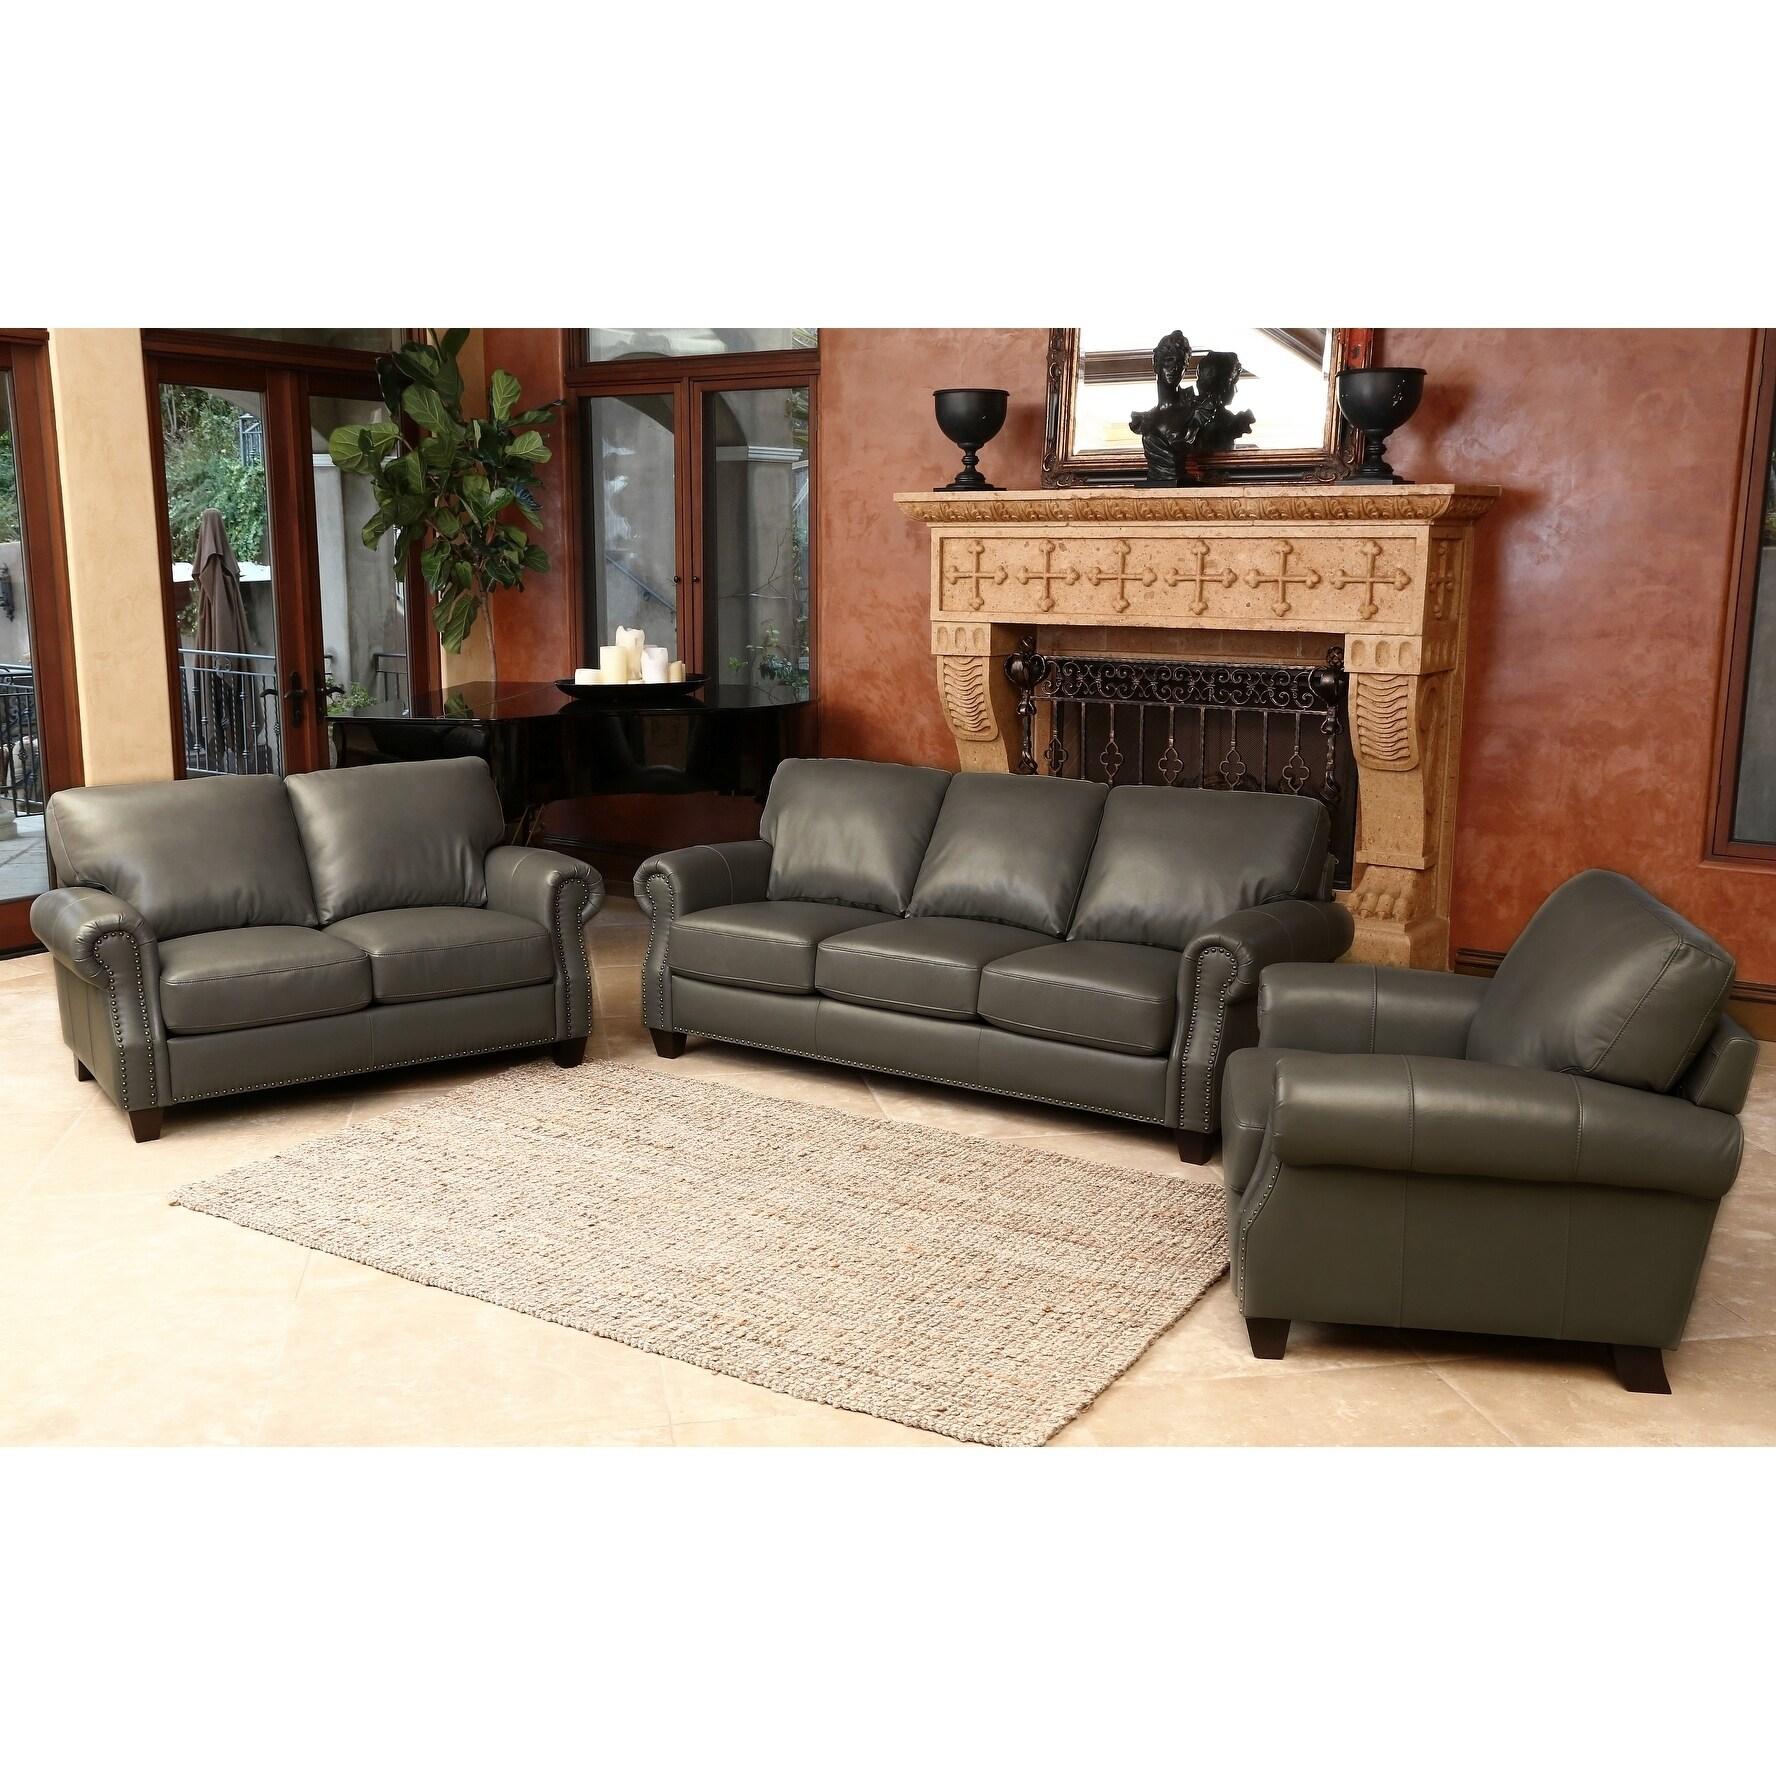 Abbyson Landon Top Grain Leather 3 Piece Living Room Set - Free ...